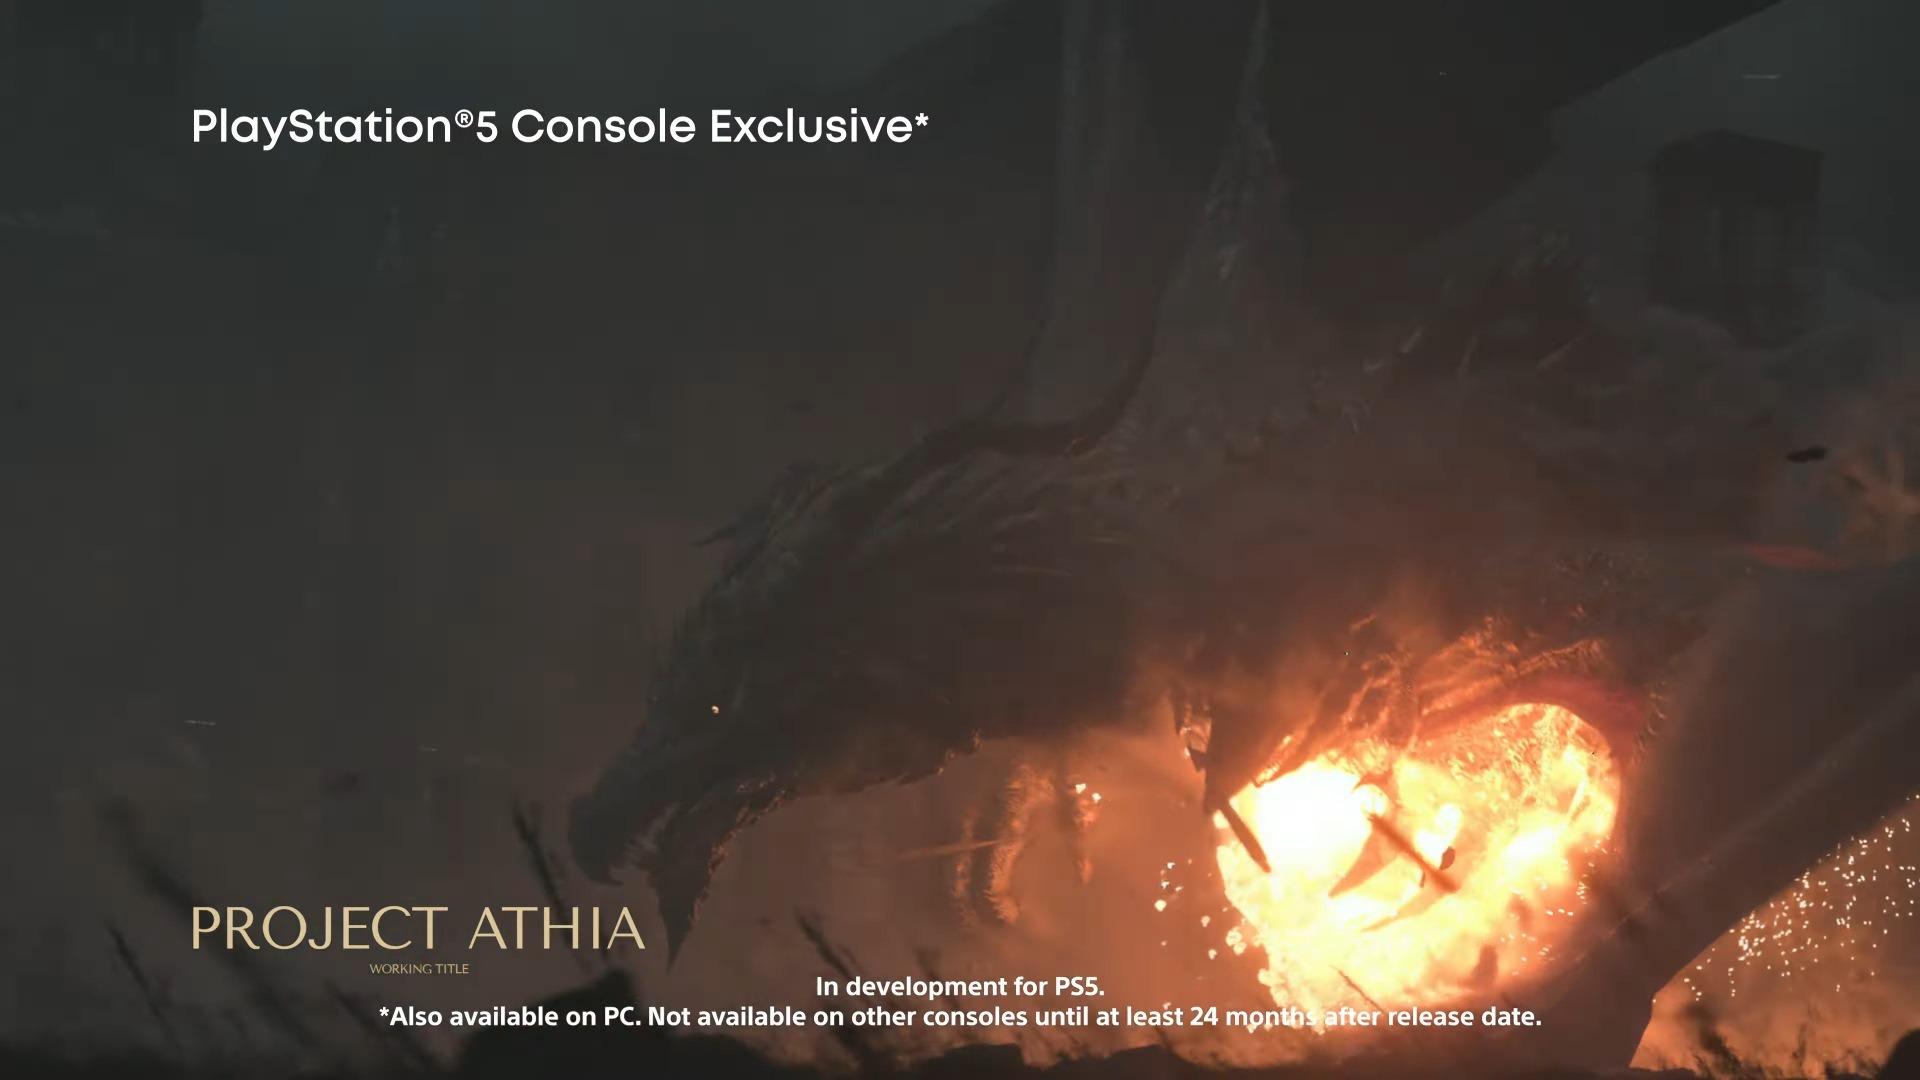 《Project Athia》将为PS5独占两年 还将登陆PC